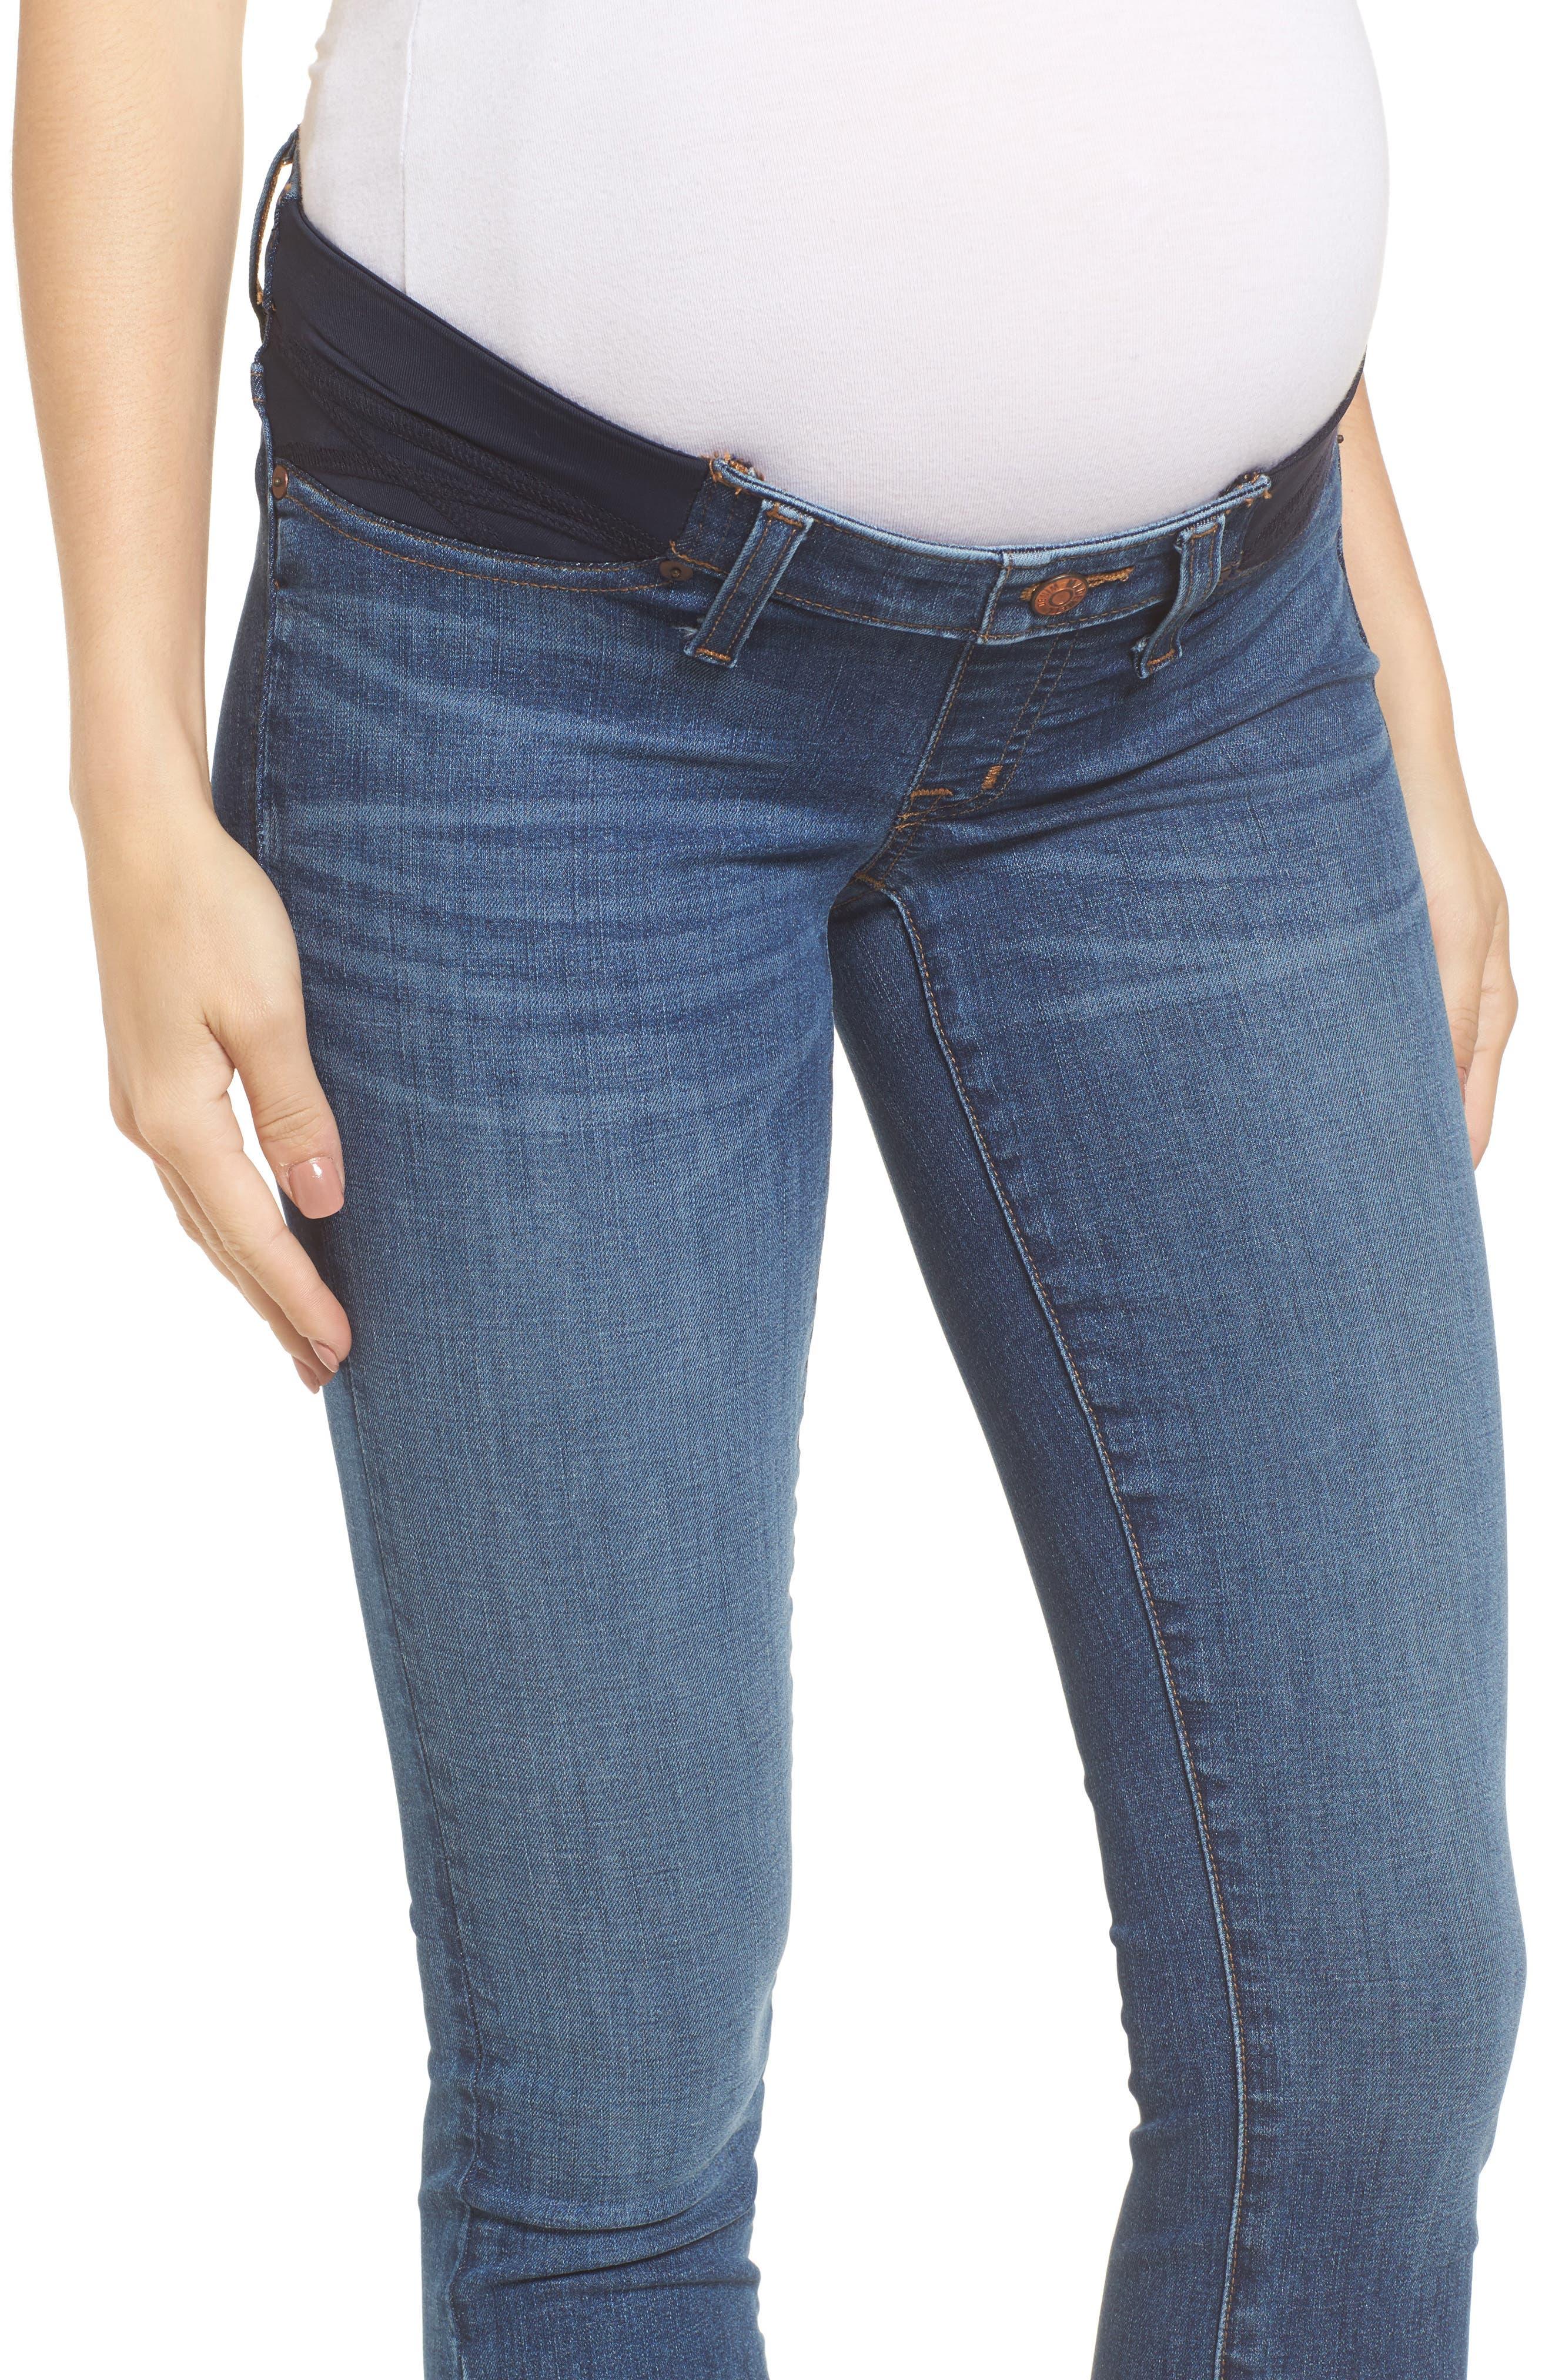 Maternity Skinny Jeans,                             Alternate thumbnail 4, color,                             Juliet Wash